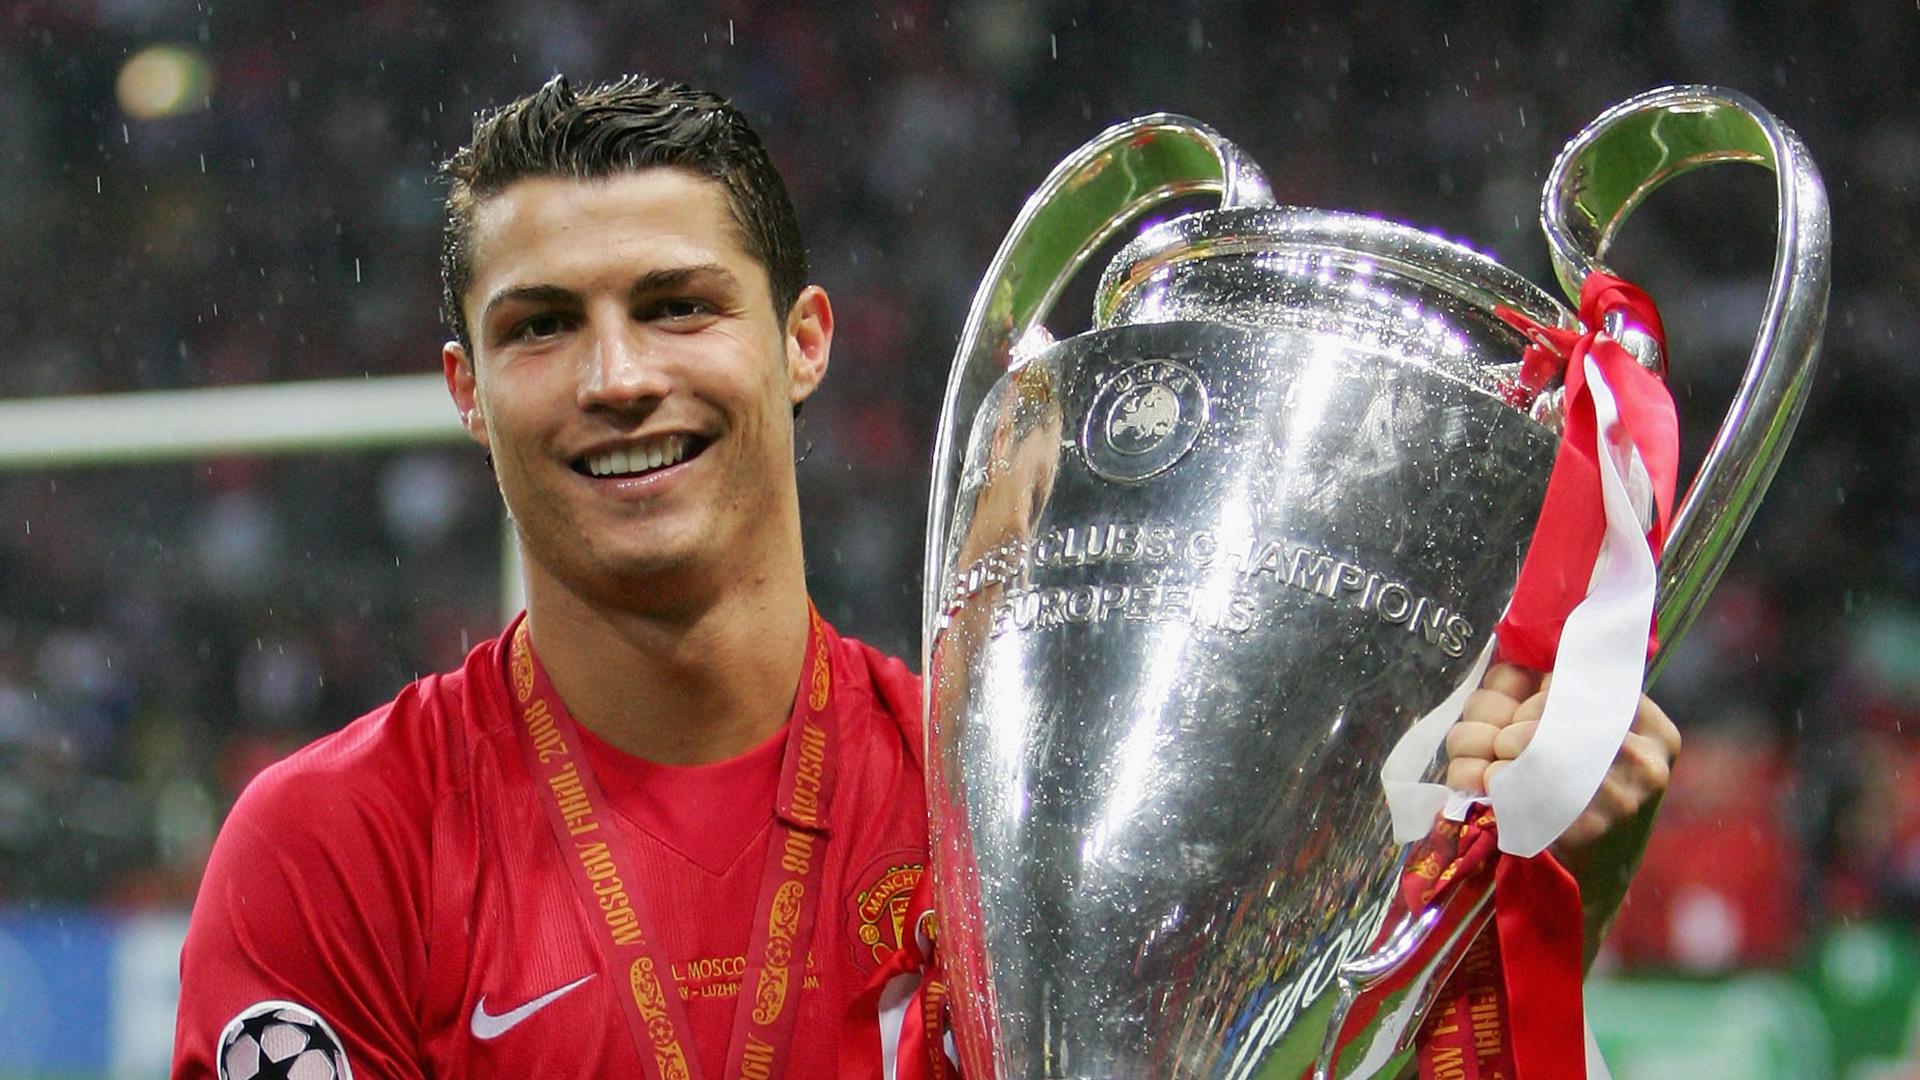 Man Utd To Offer De Gea Plus £183m For Real Madrid Duo Cristiano Ronaldo And Alvaro Morata